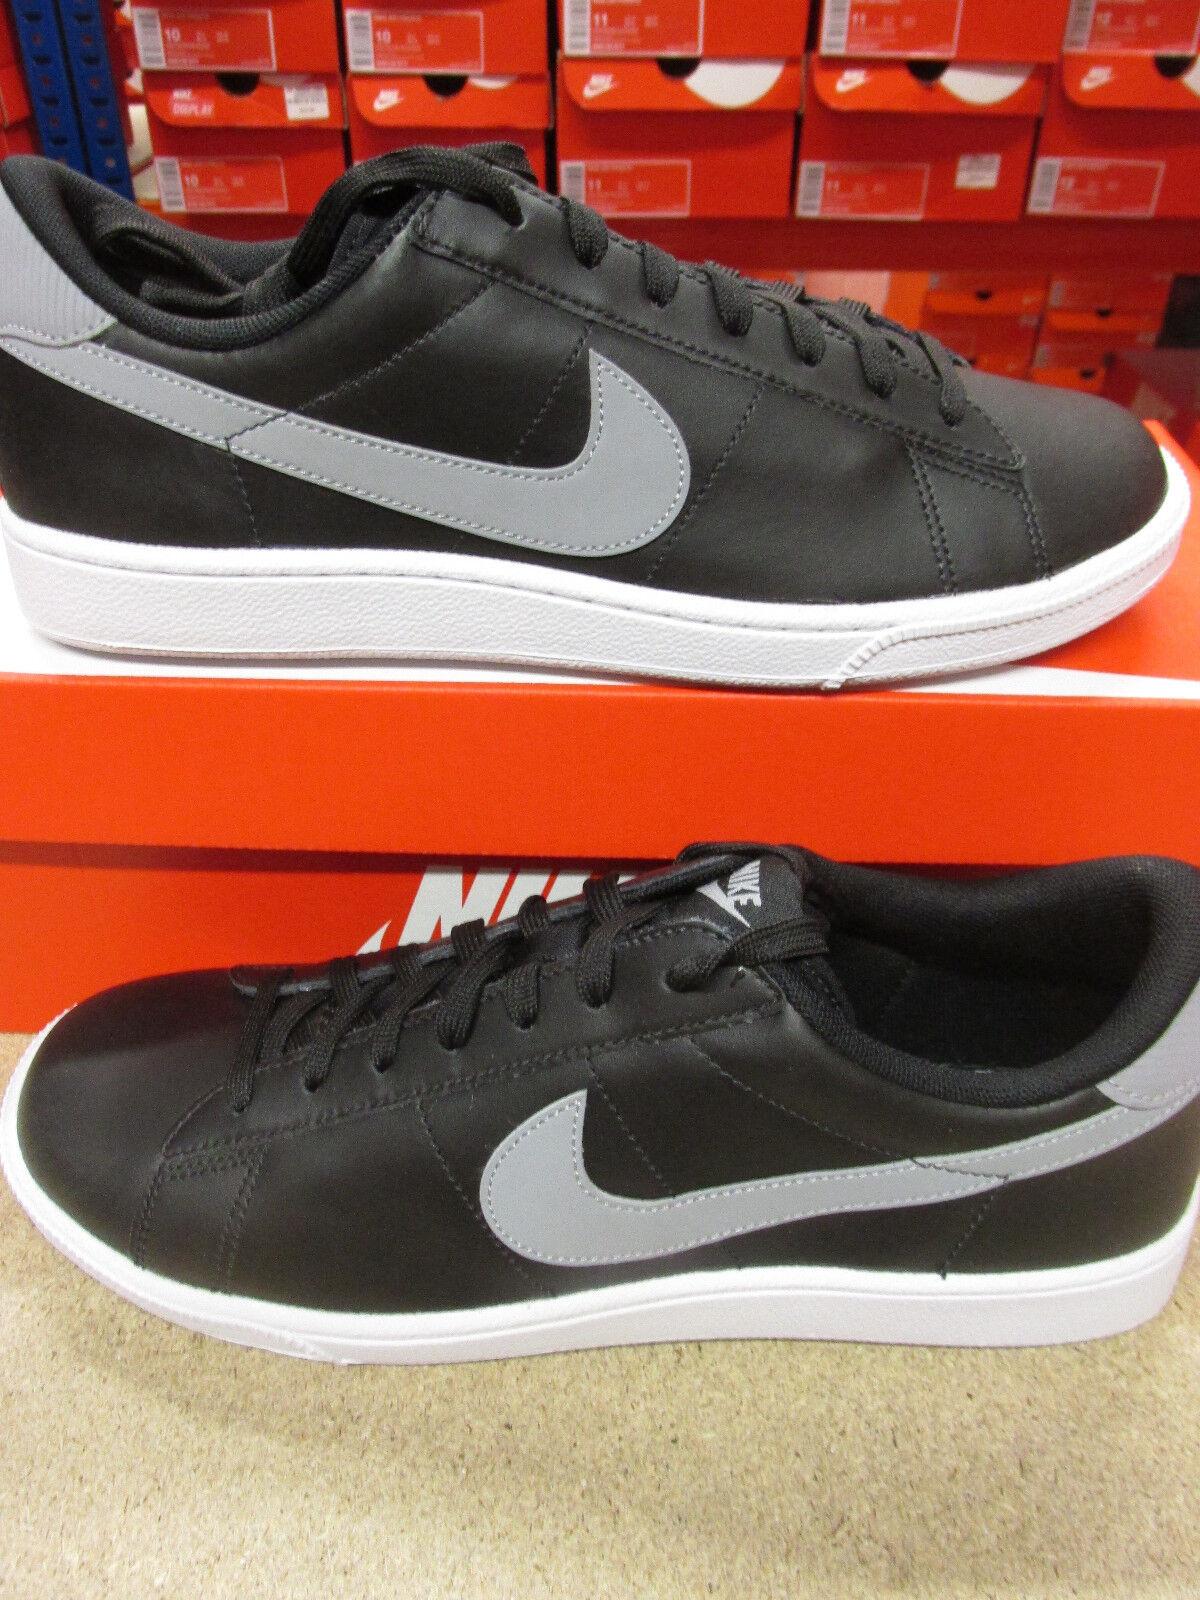 nike tennis classic CS mens trainers 683613 012 sneakers shoes